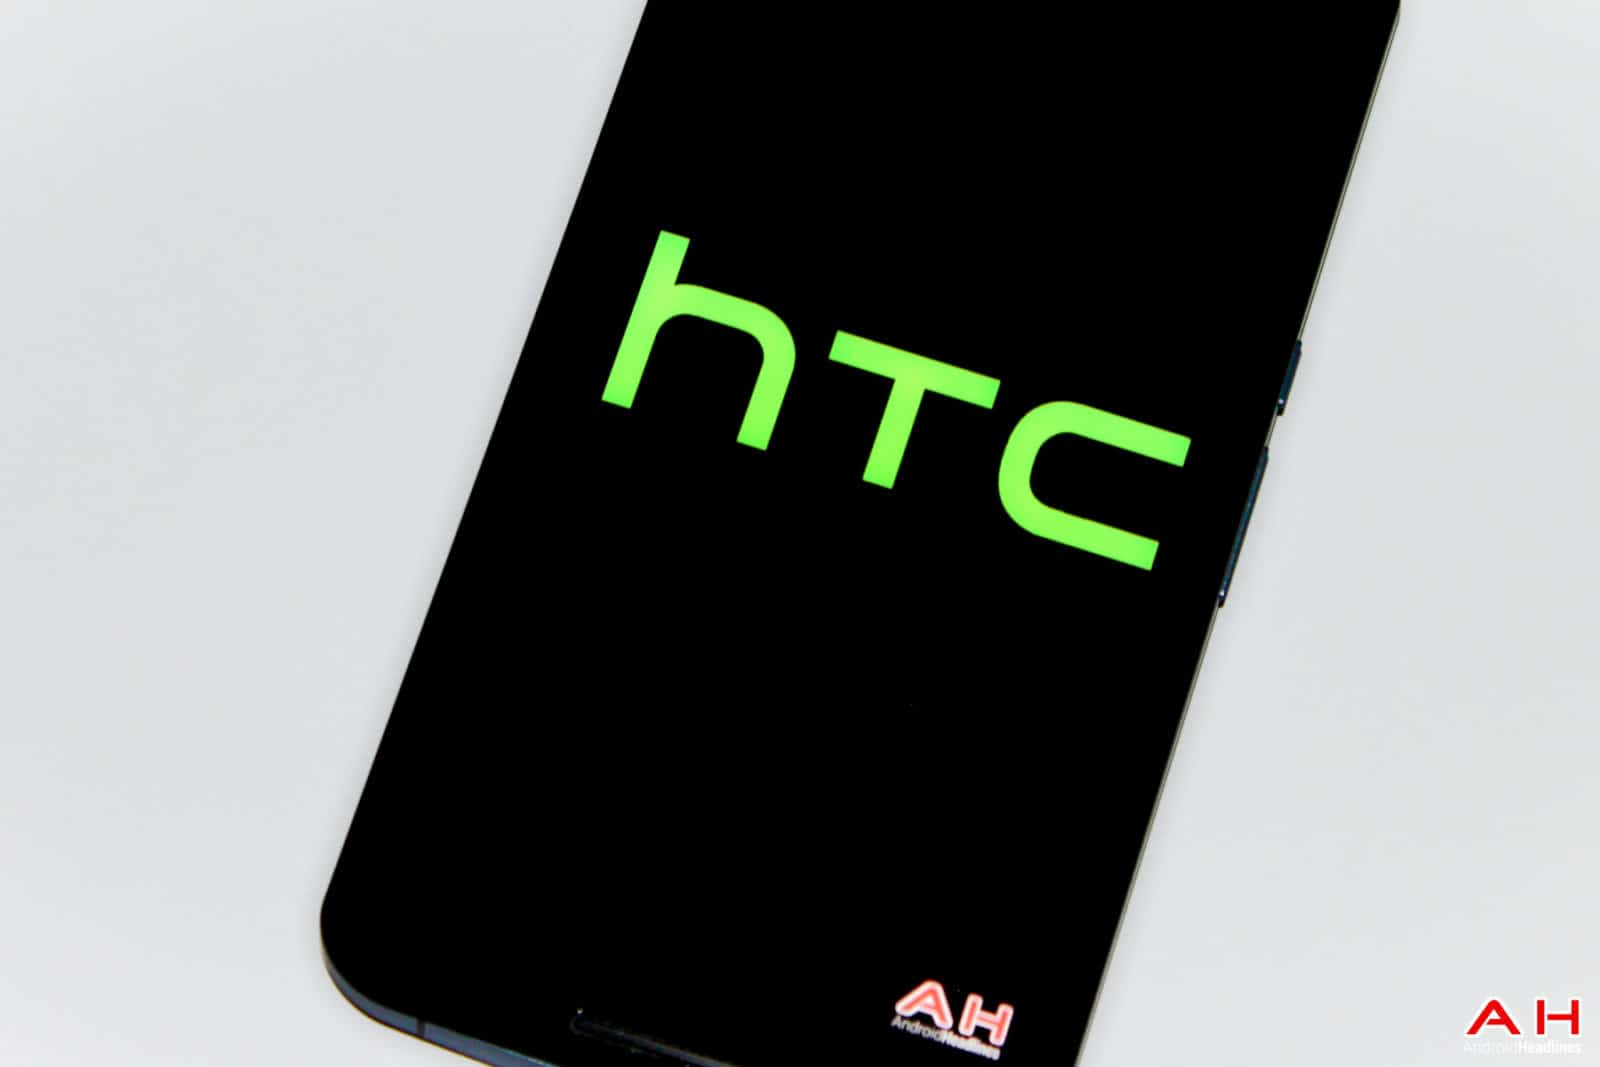 AH 2015 HTC LOGO Chris Sept-20